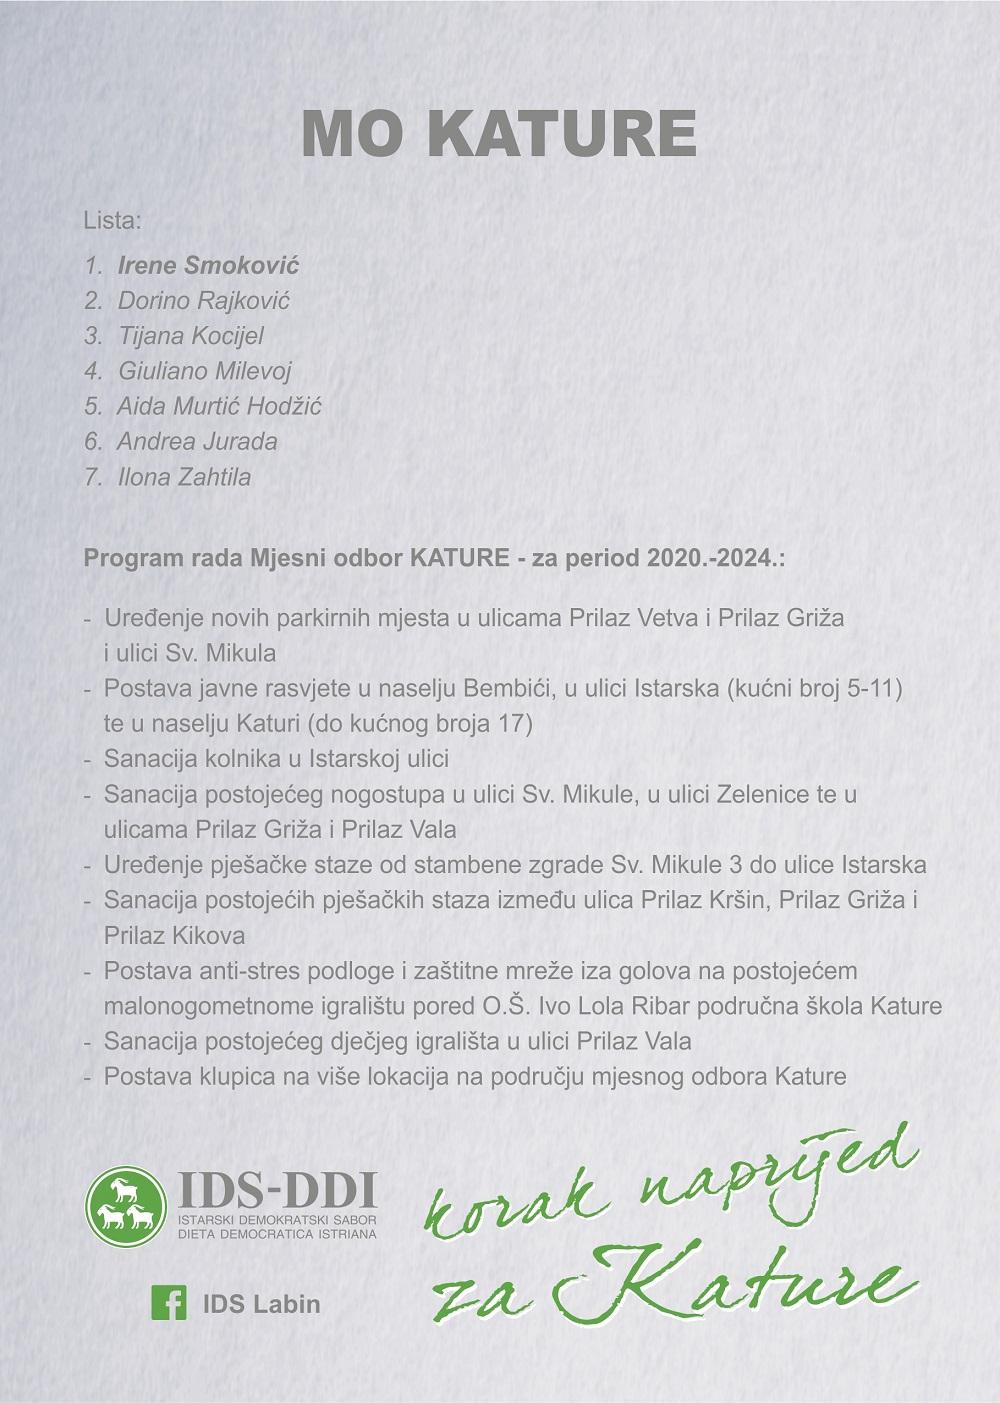 Kature program[113803]